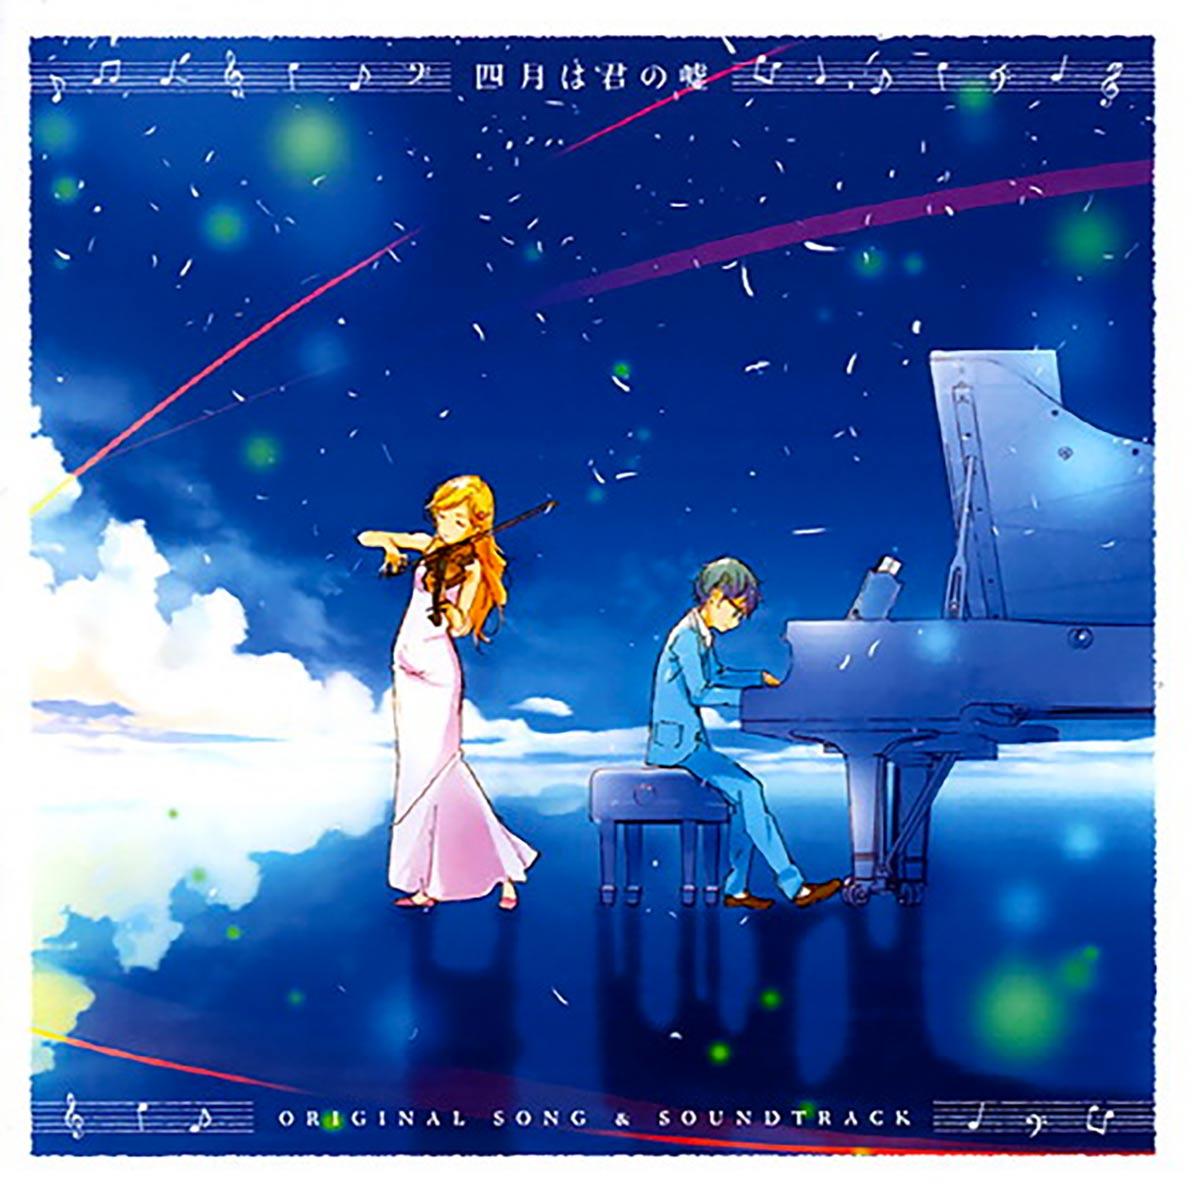 Roblox Iq Songs Play Watashi No Uso Piano Music Sheet On Virtual Piano